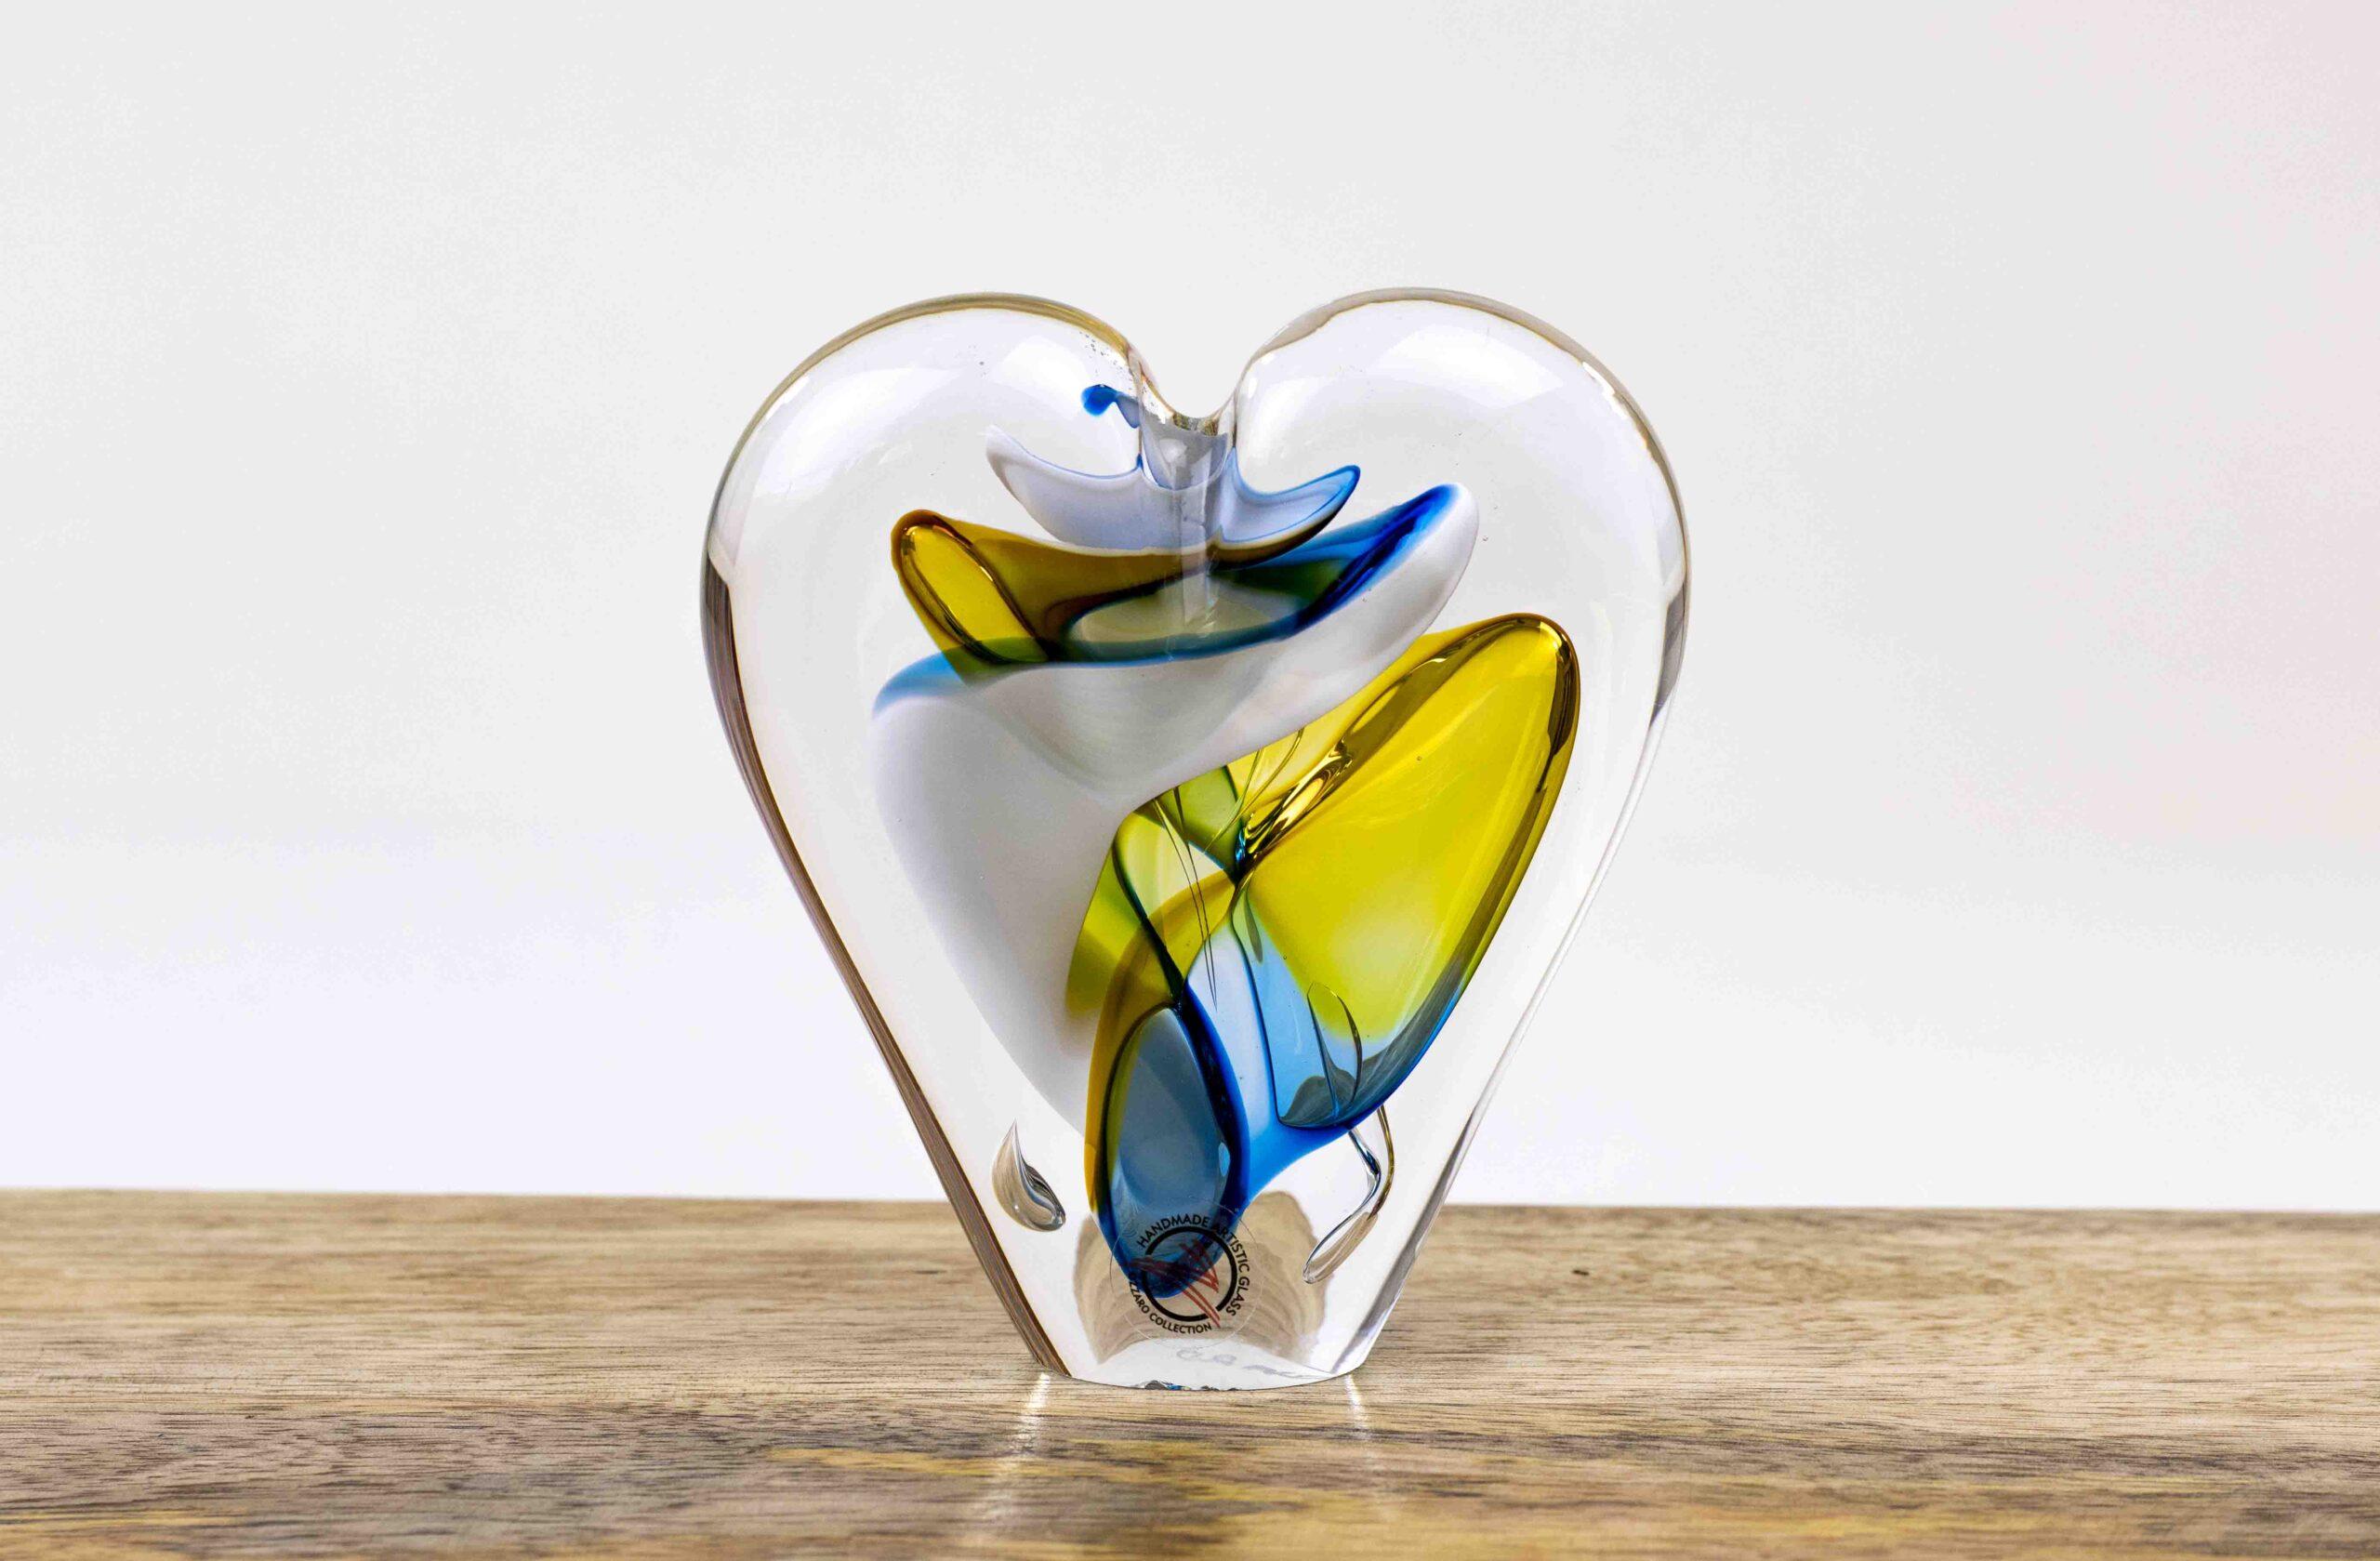 hart kristal cadeau